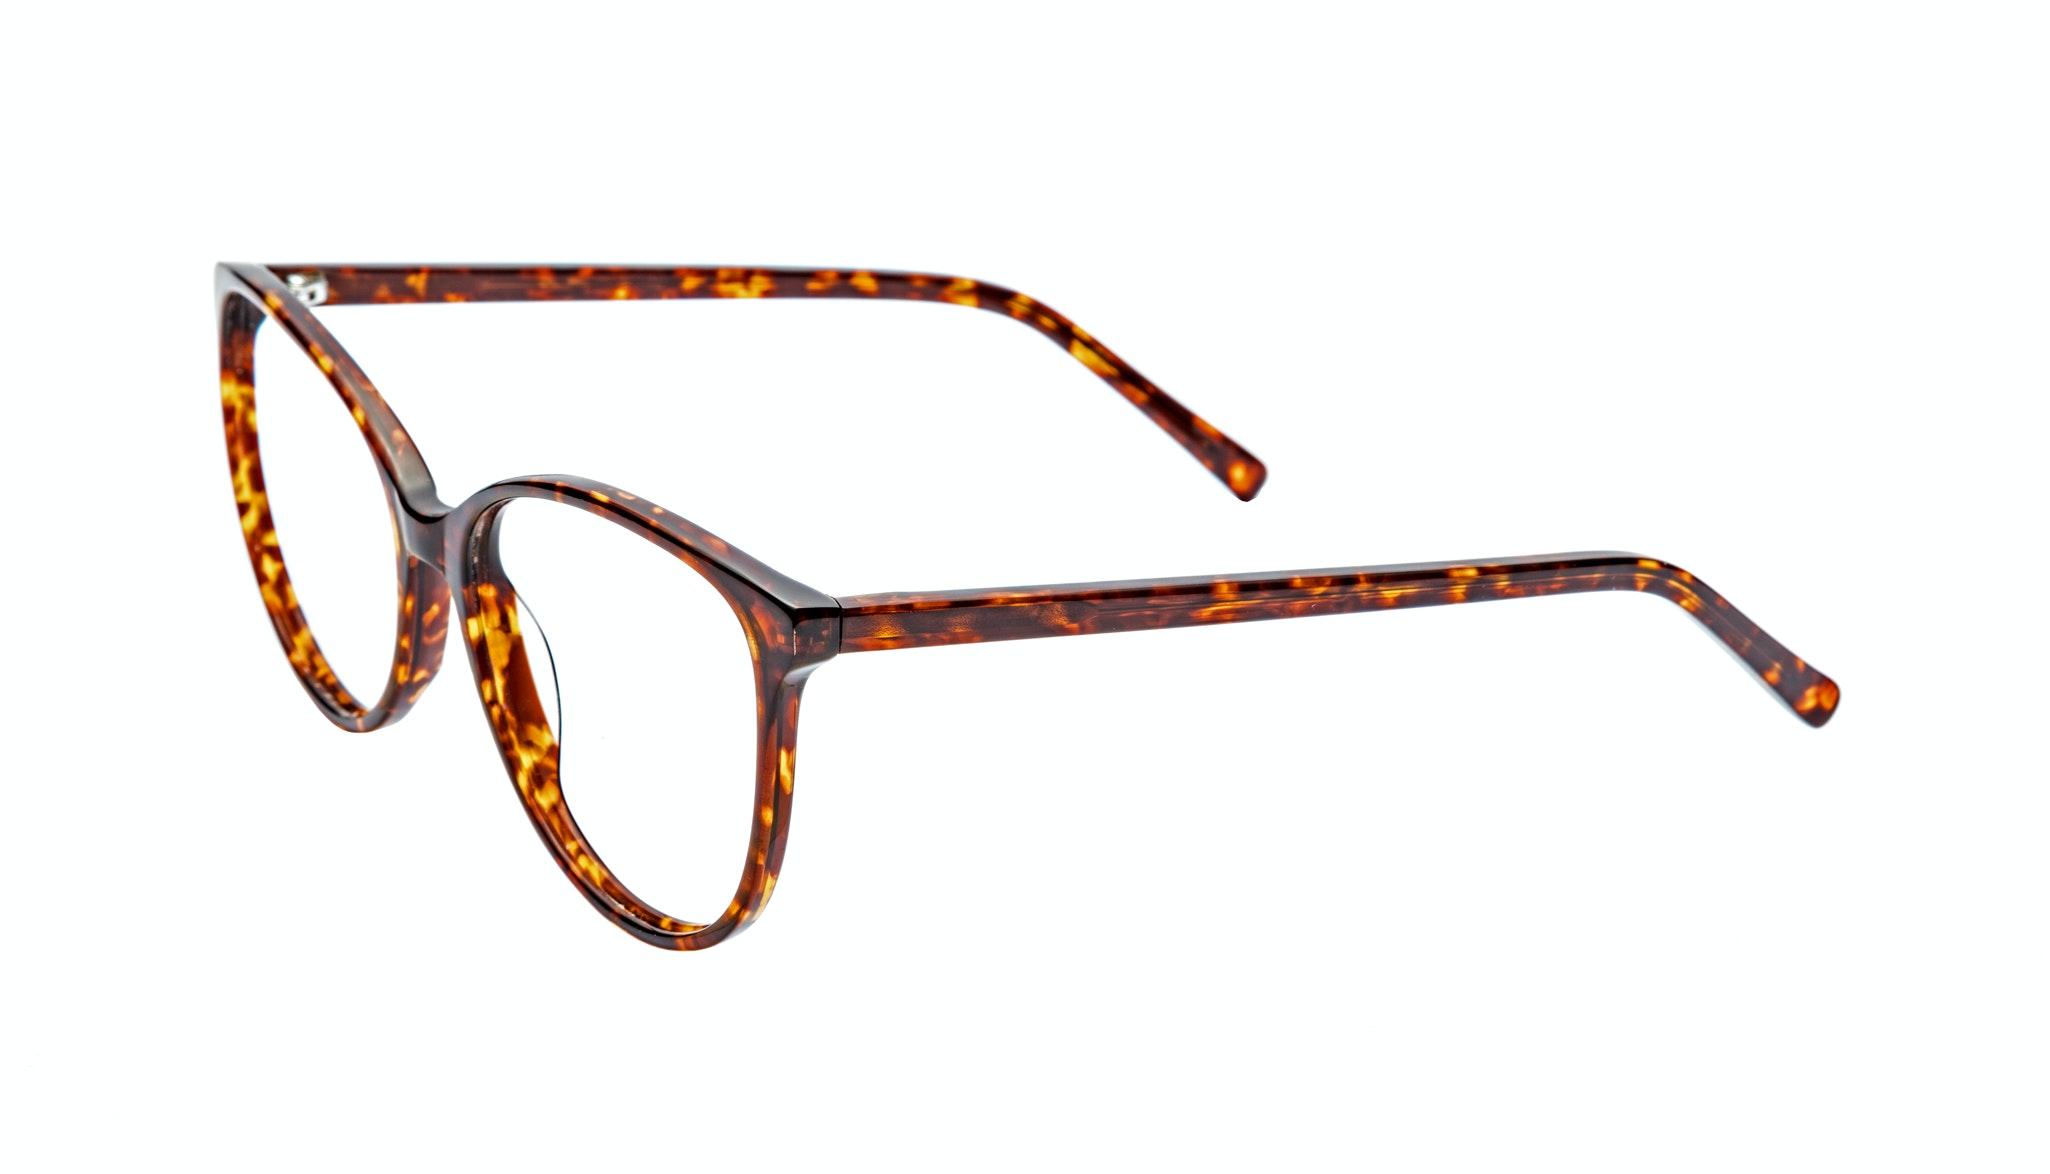 Affordable Fashion Glasses Round Eyeglasses Women Imagine Sepia Kiss Tilt